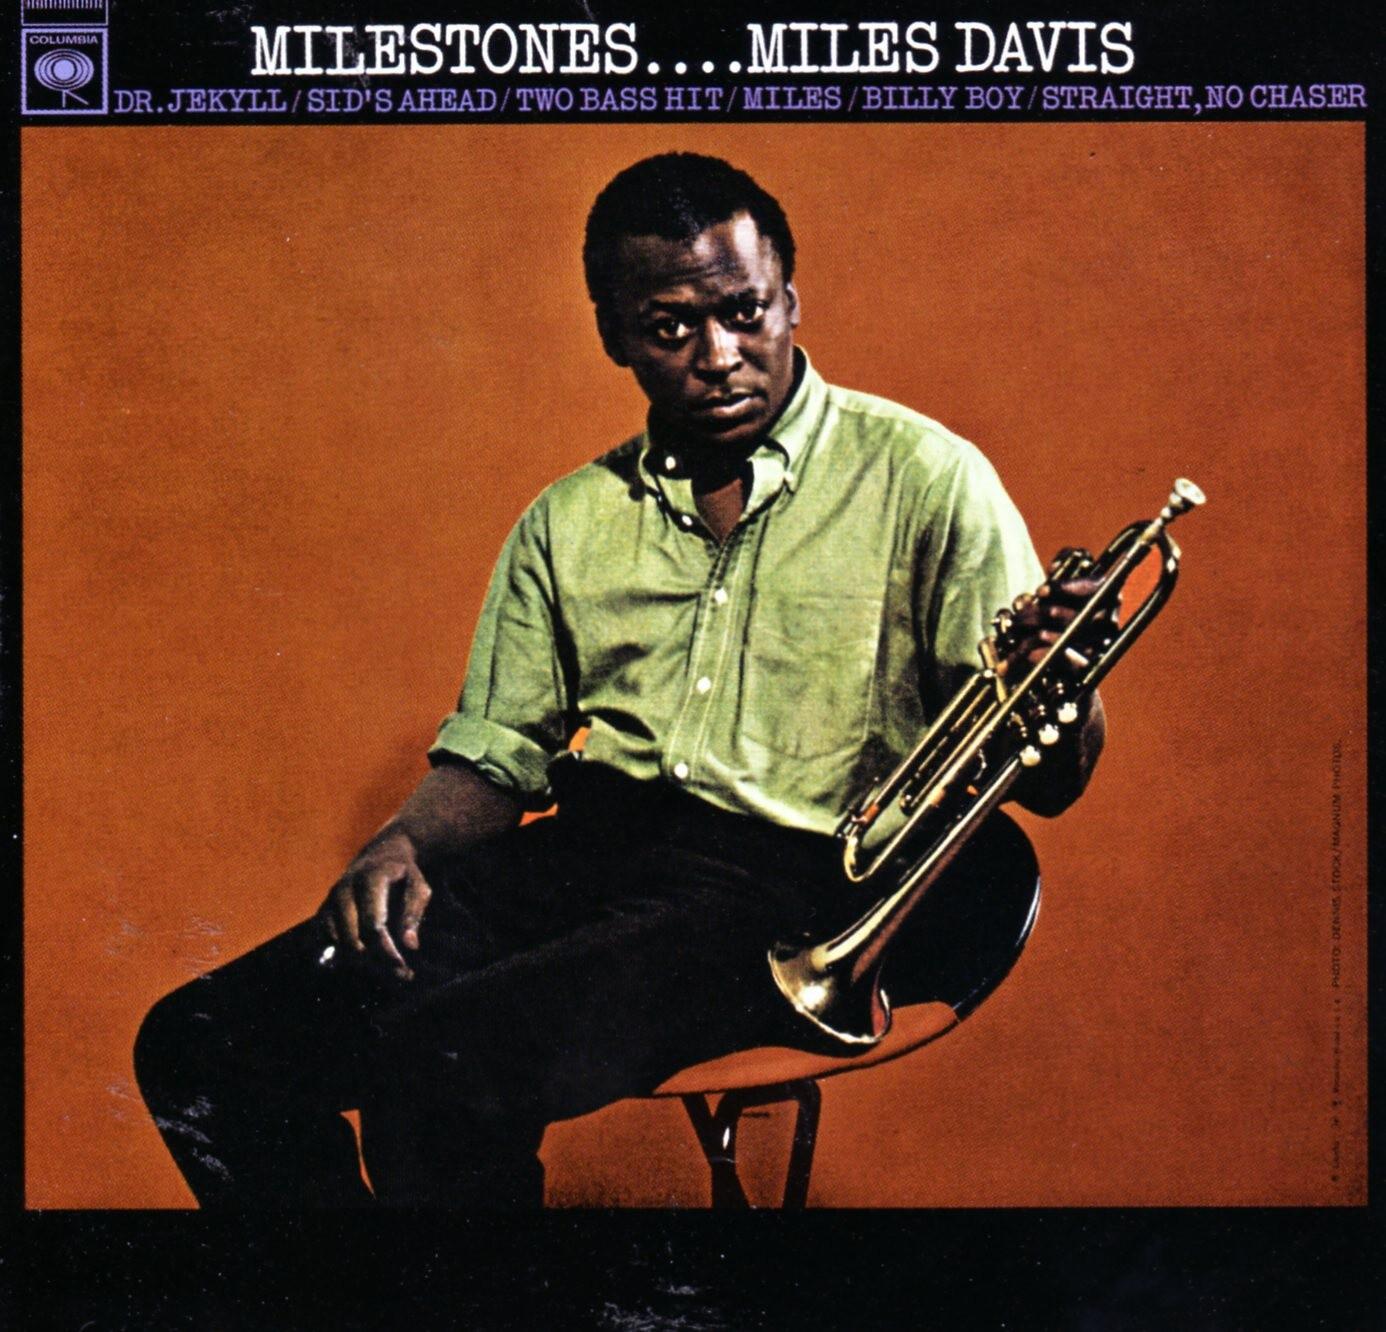 jazz GRITA!: Miles Davis - Milestones (1958)